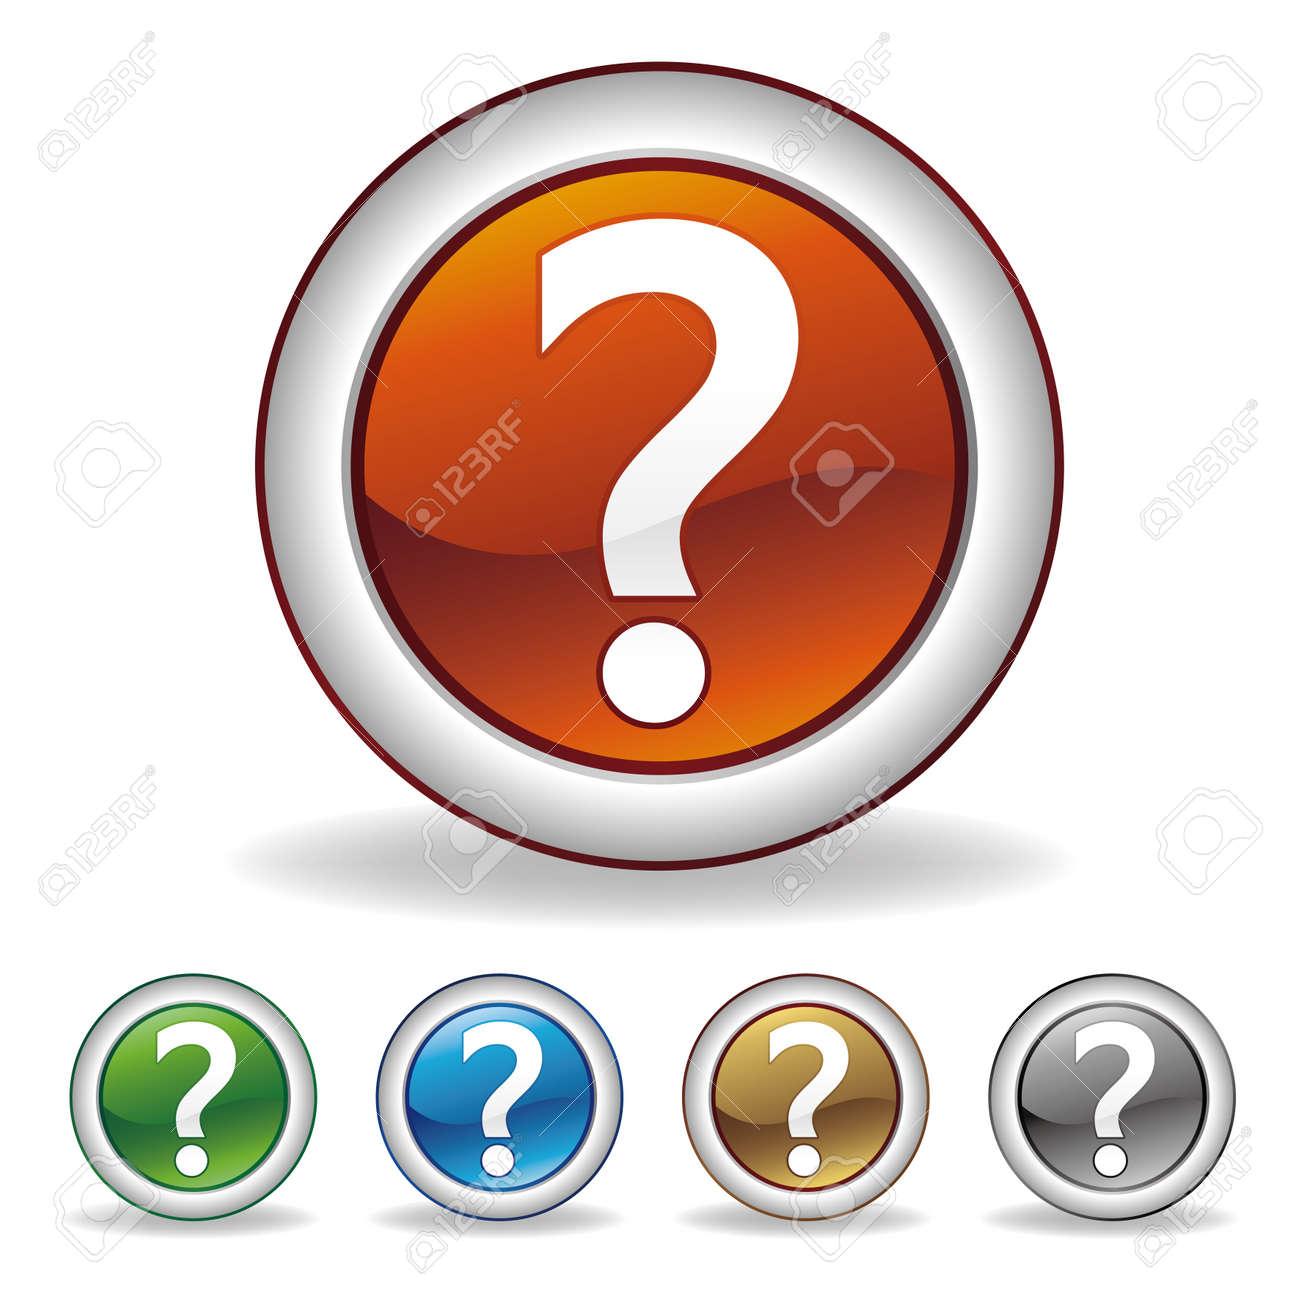 question icon Stock Vector - 7528638